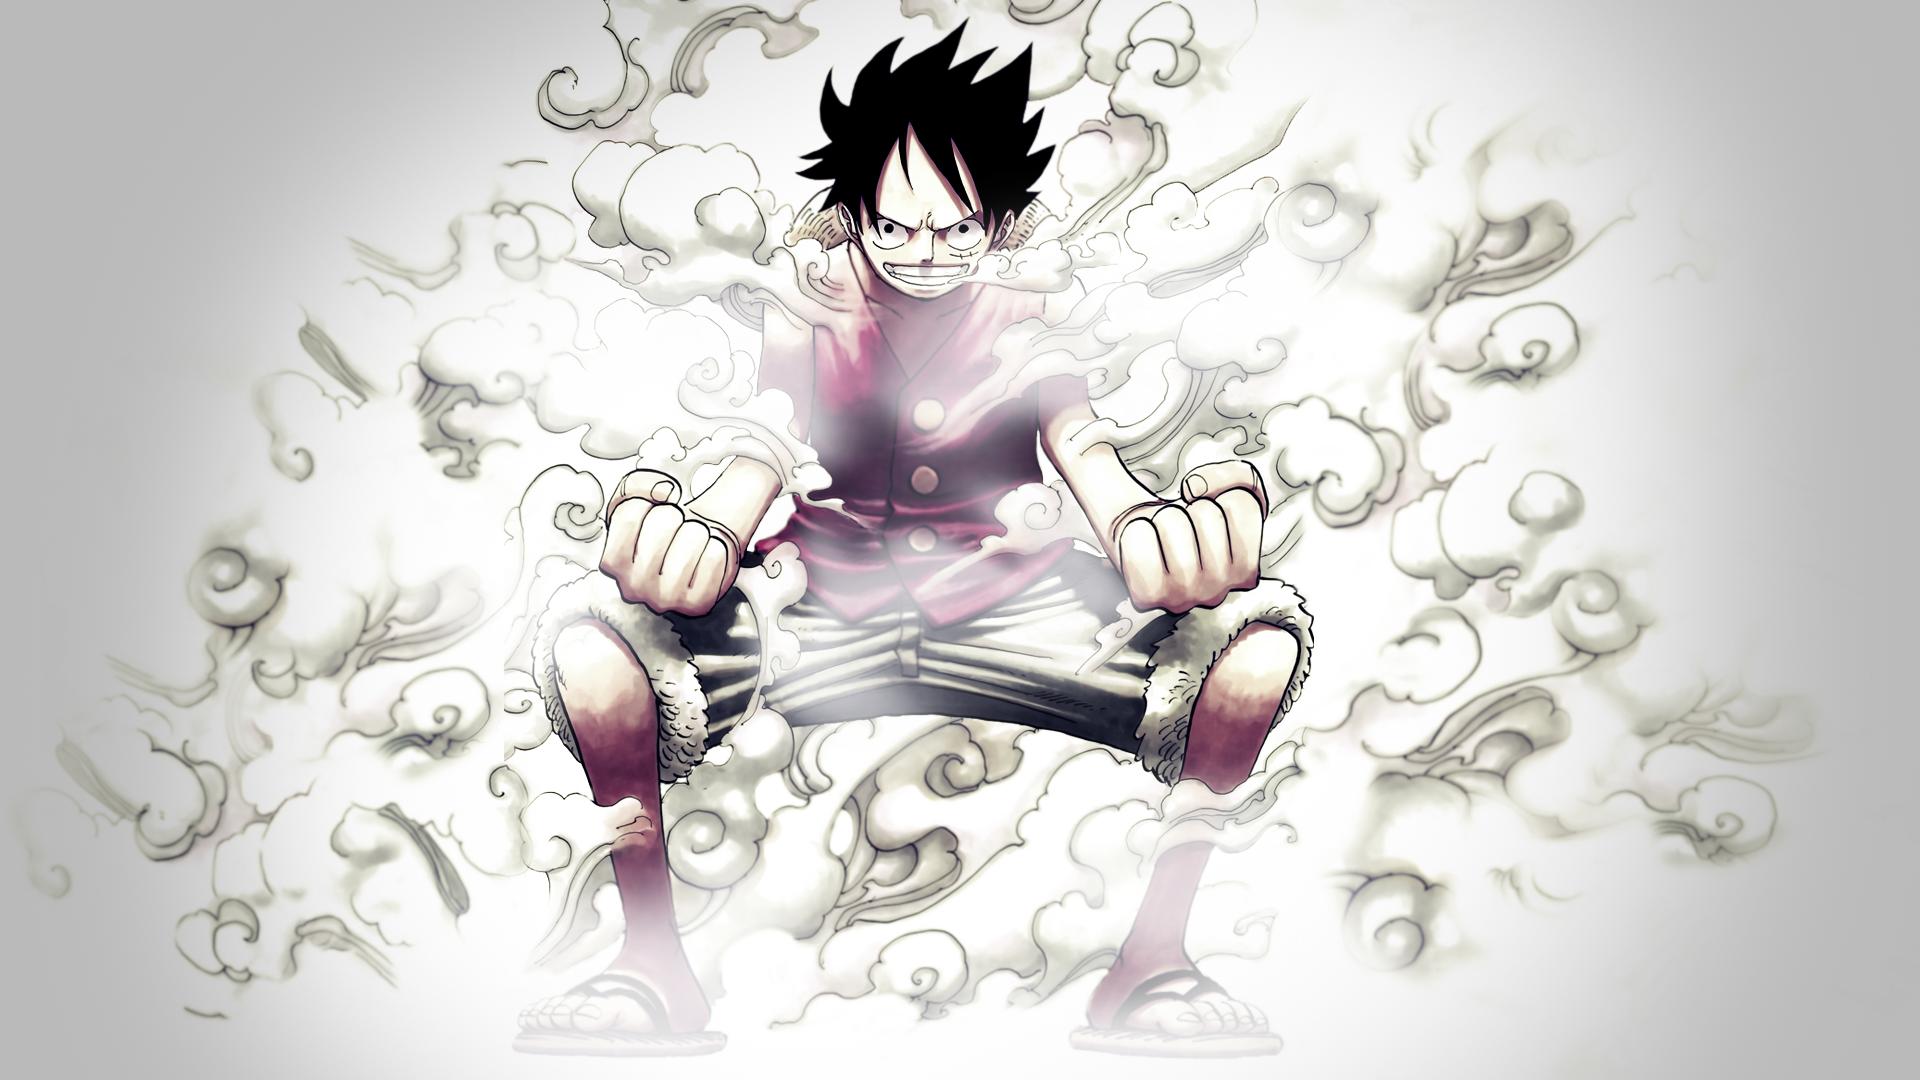 Luffy One Piece Wallpa... One Piece Wallpaper Luffy Gear Fourth